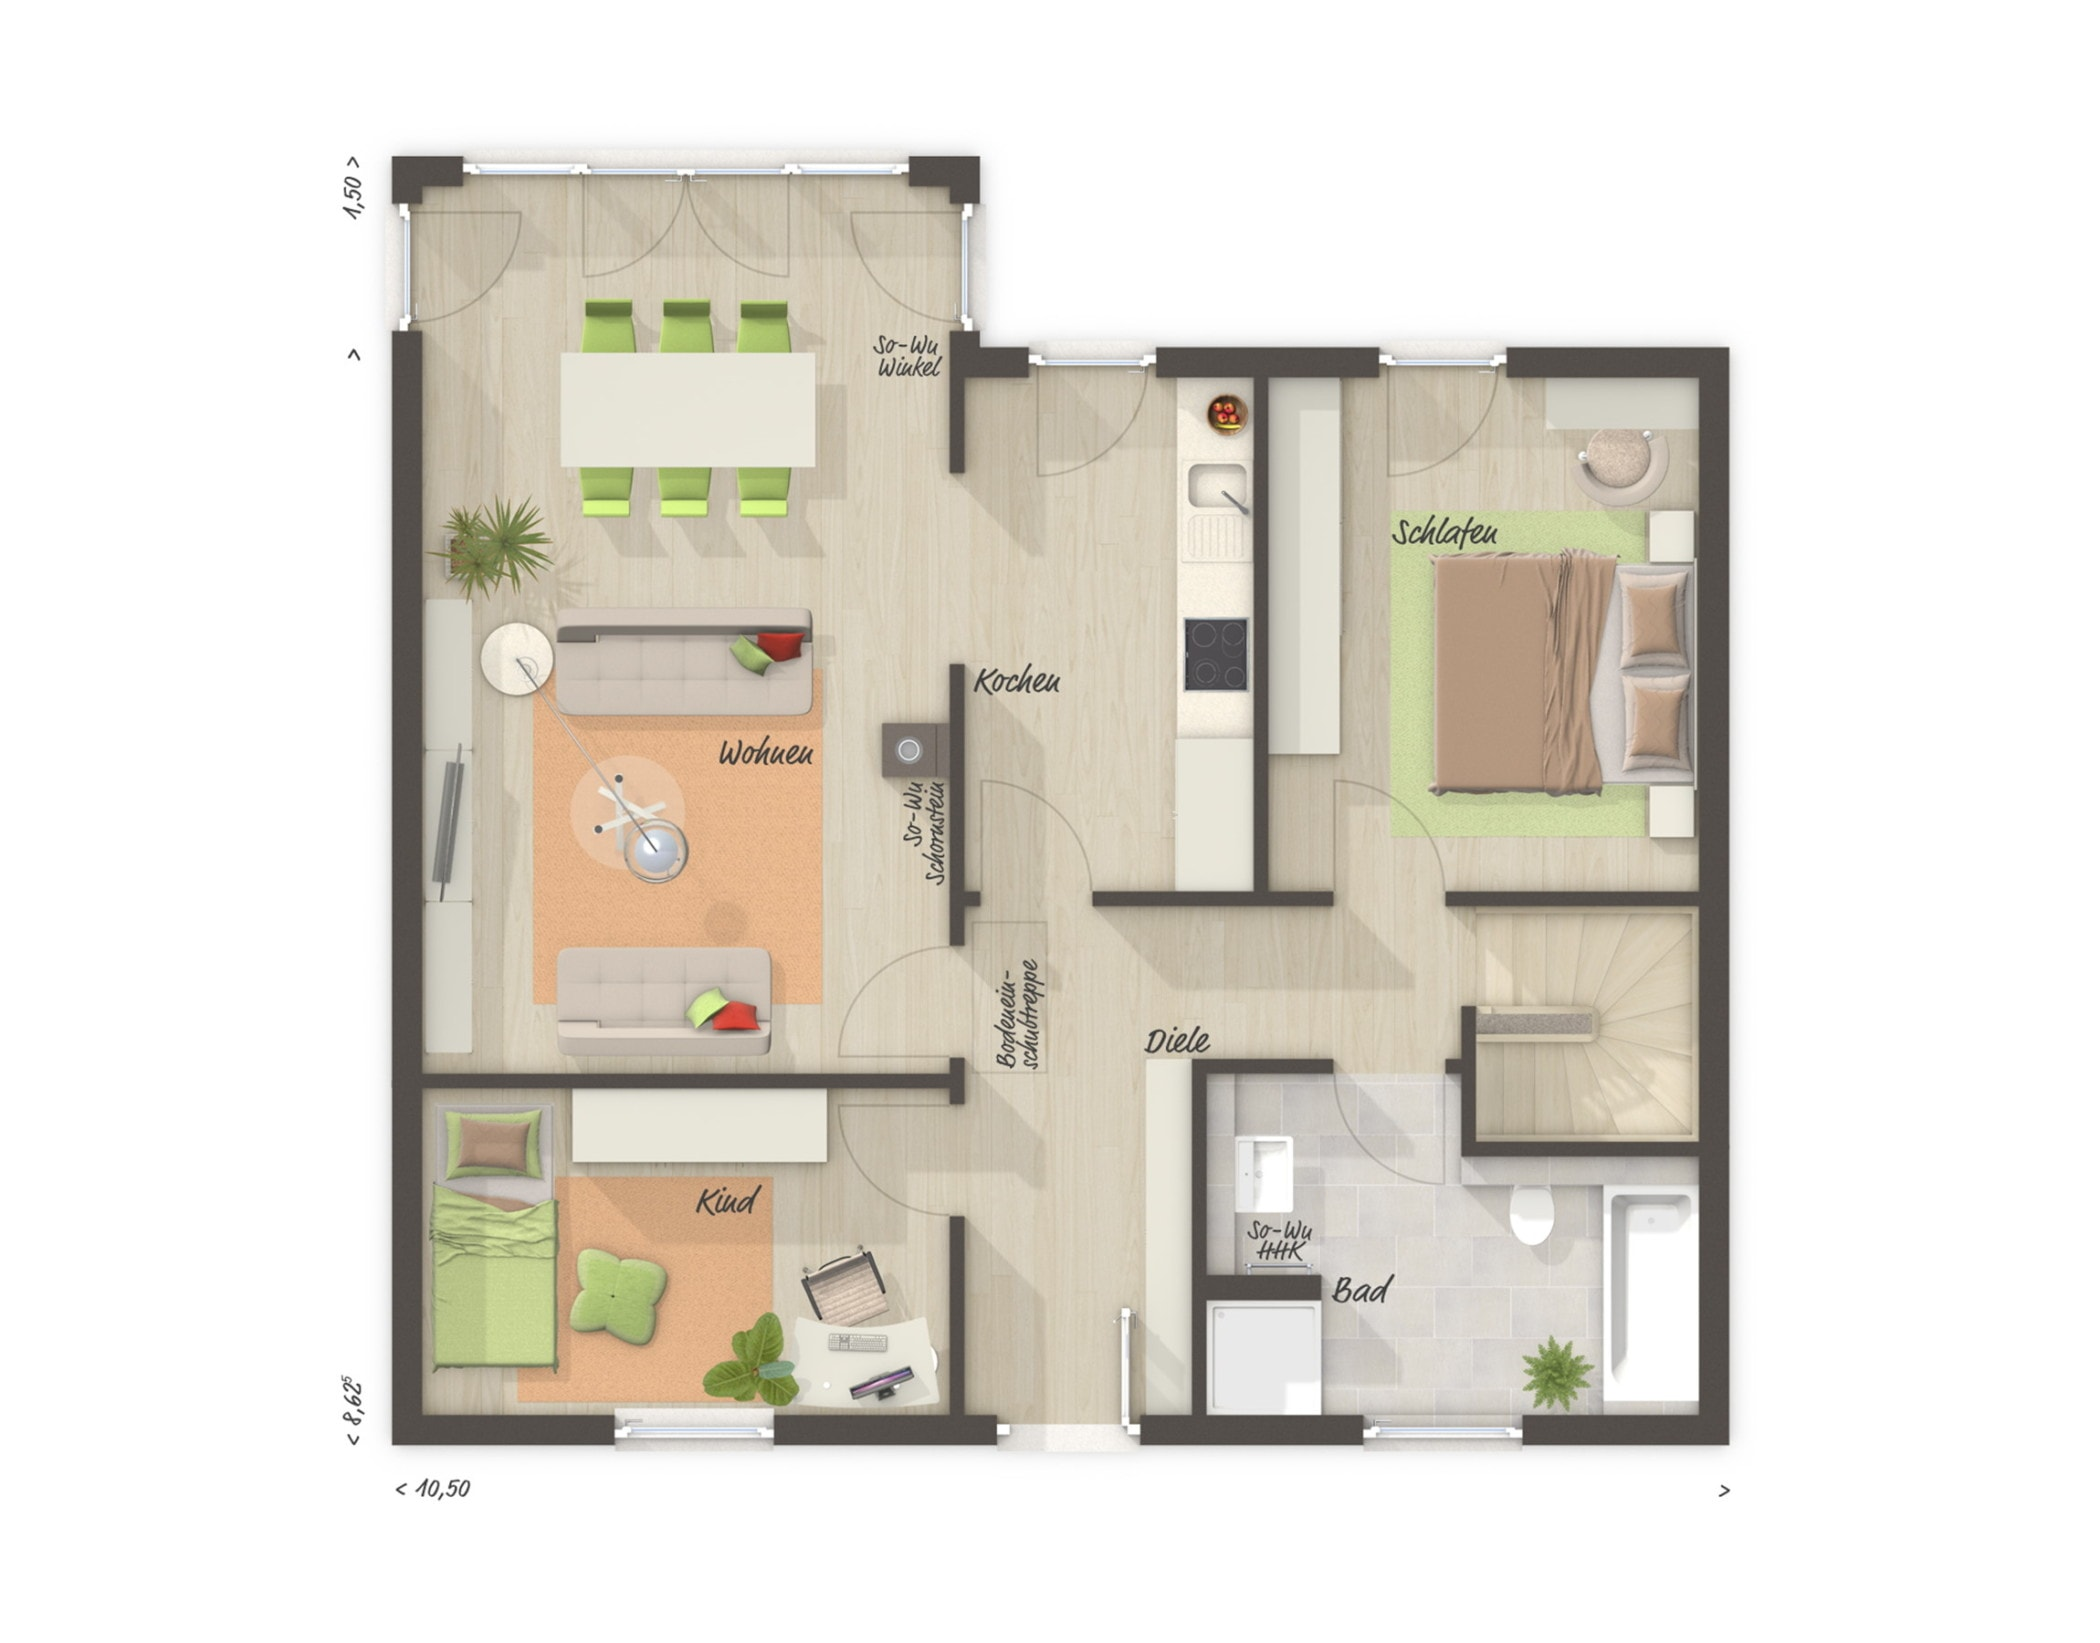 Bungalow Haus Grundriss mit Keller & Erker, 3 Zimmer, 77 qm - Massivhaus bauen Ideen Town Country Haus Bungalow 78 - HausbauDirekt.de